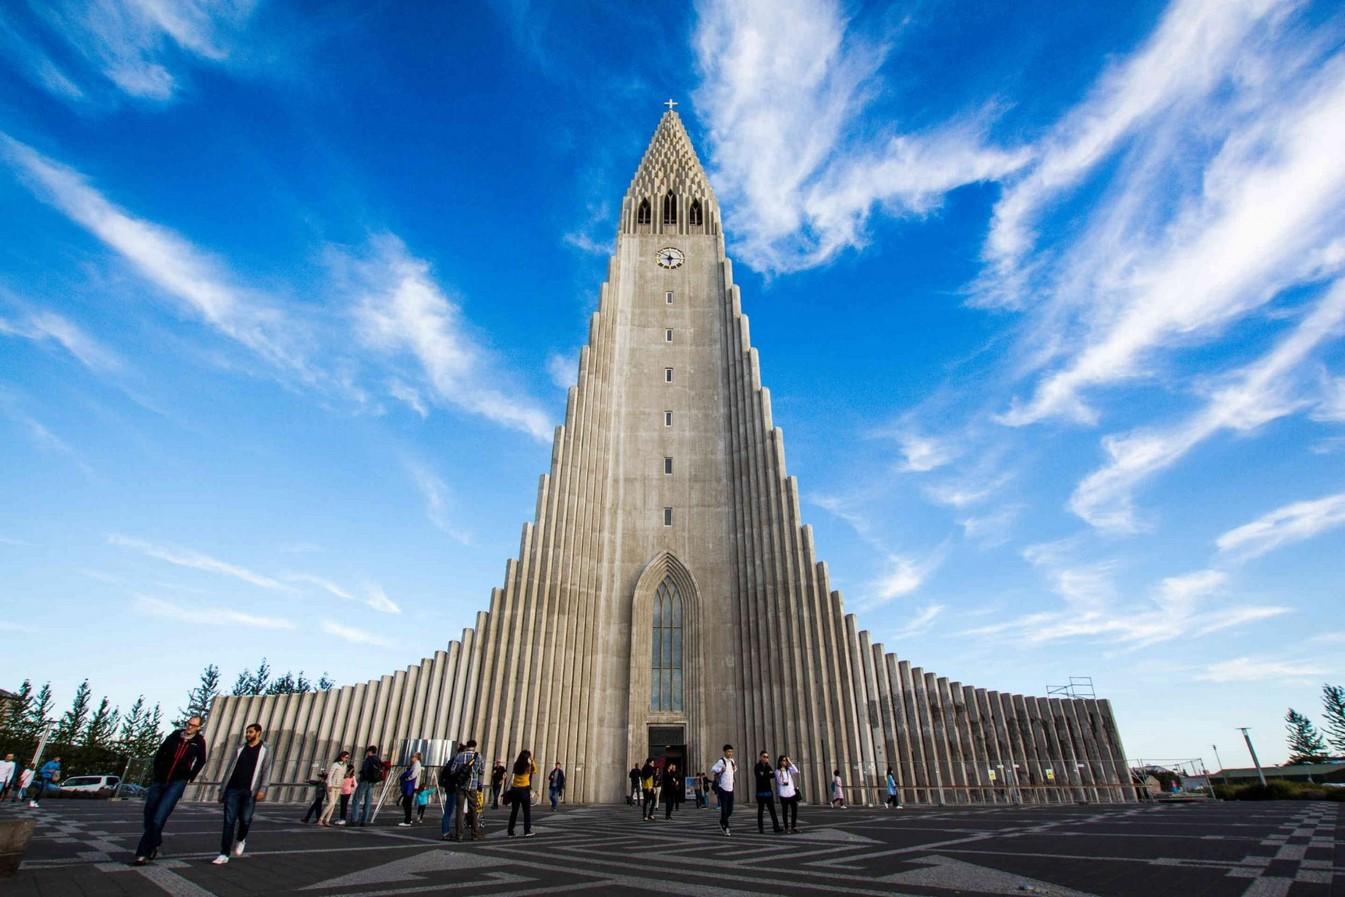 Hallgrímskirkja church, Iceland - Sheet1